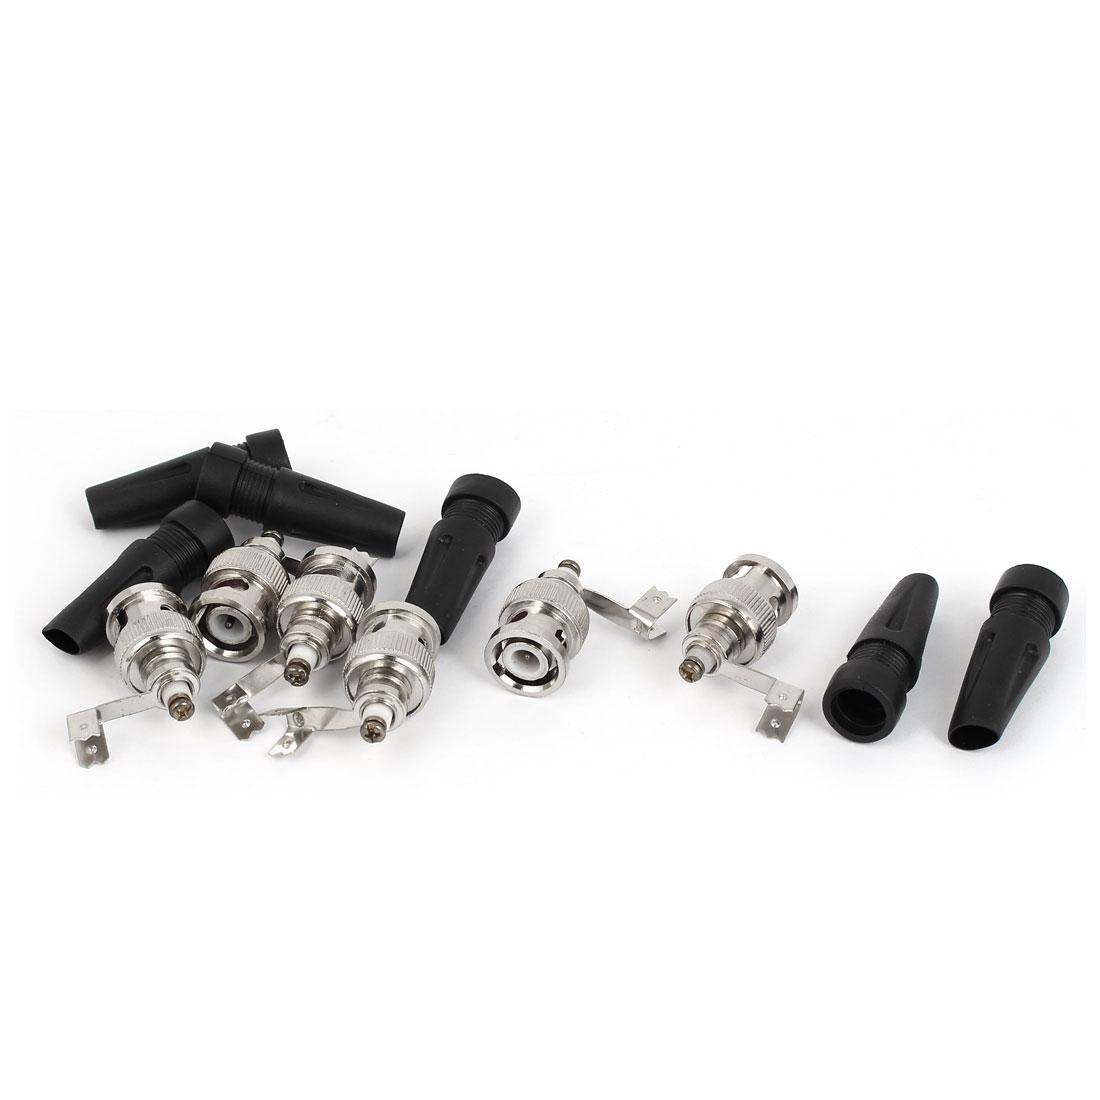 Black Sleeve Video RF Coax Coaxial BNC Male Cable Connectors Coupler 6 Pcs